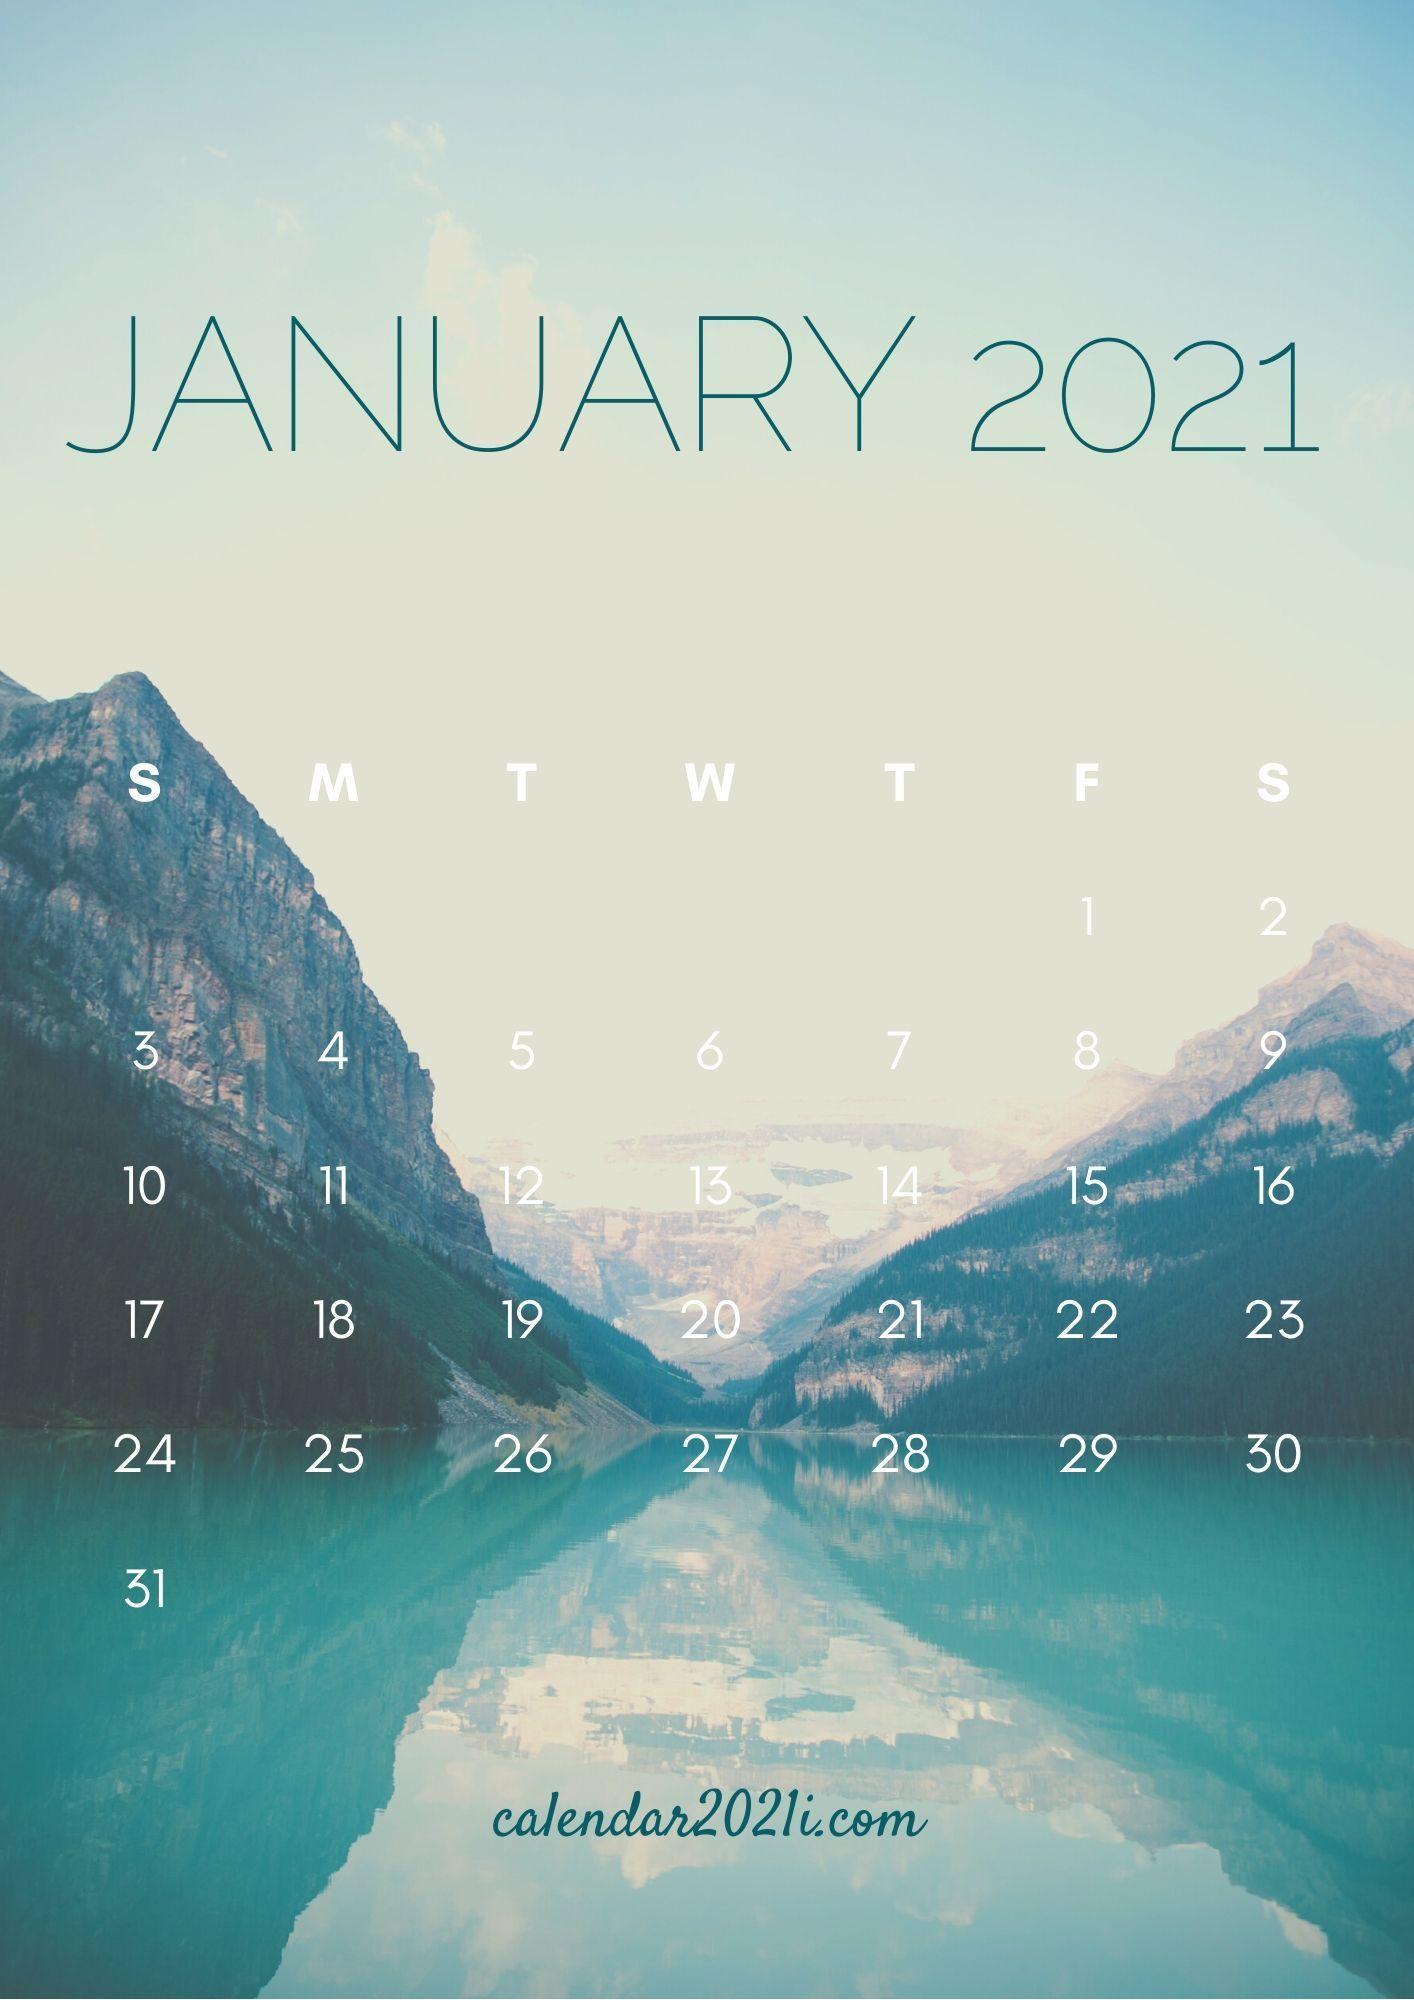 January 2021 Calendar Wallpapers 1414x2000